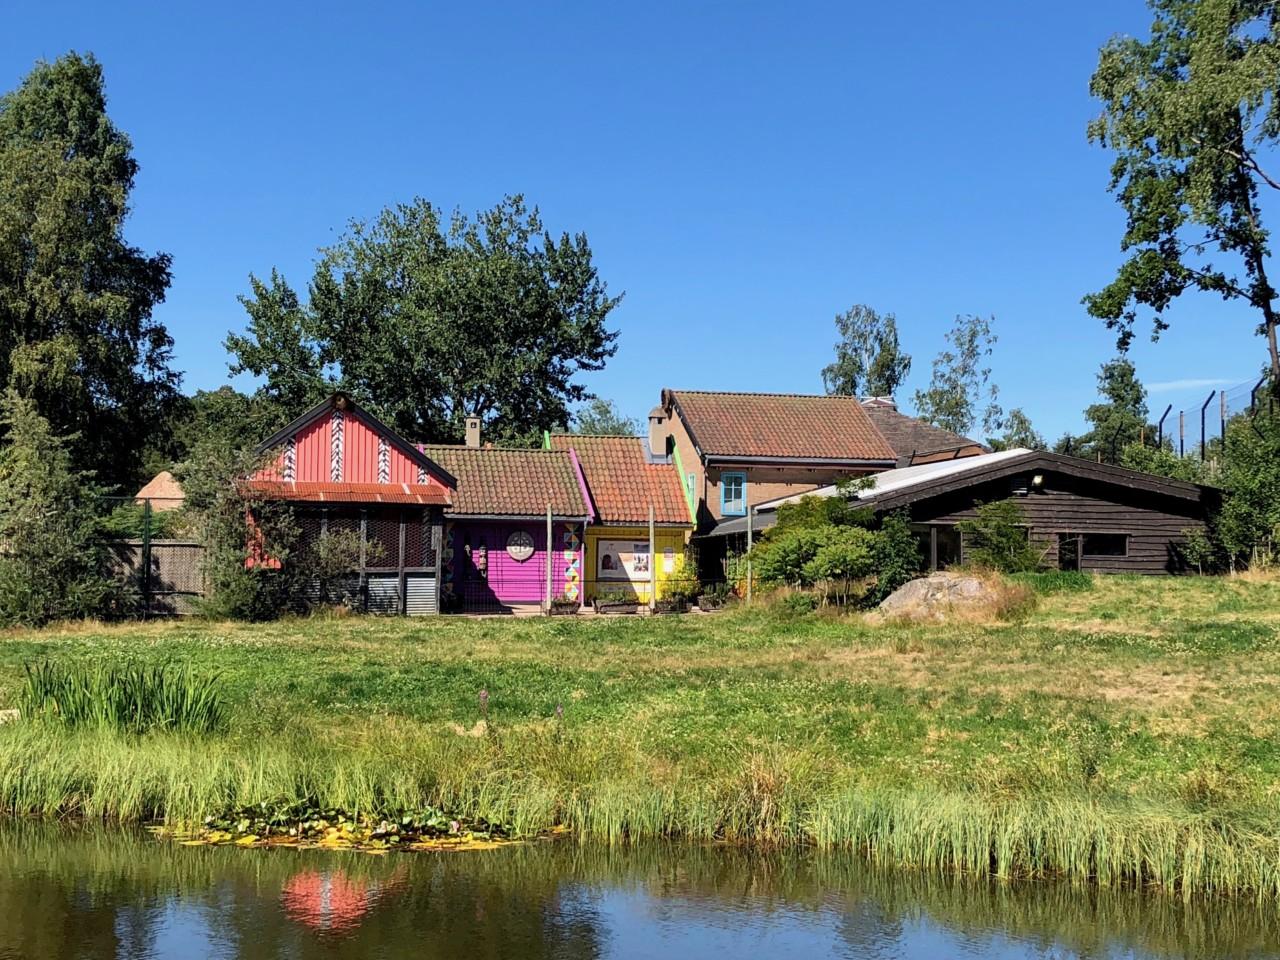 mara-naboisho-dyreparken-i-kristiansand-green-house